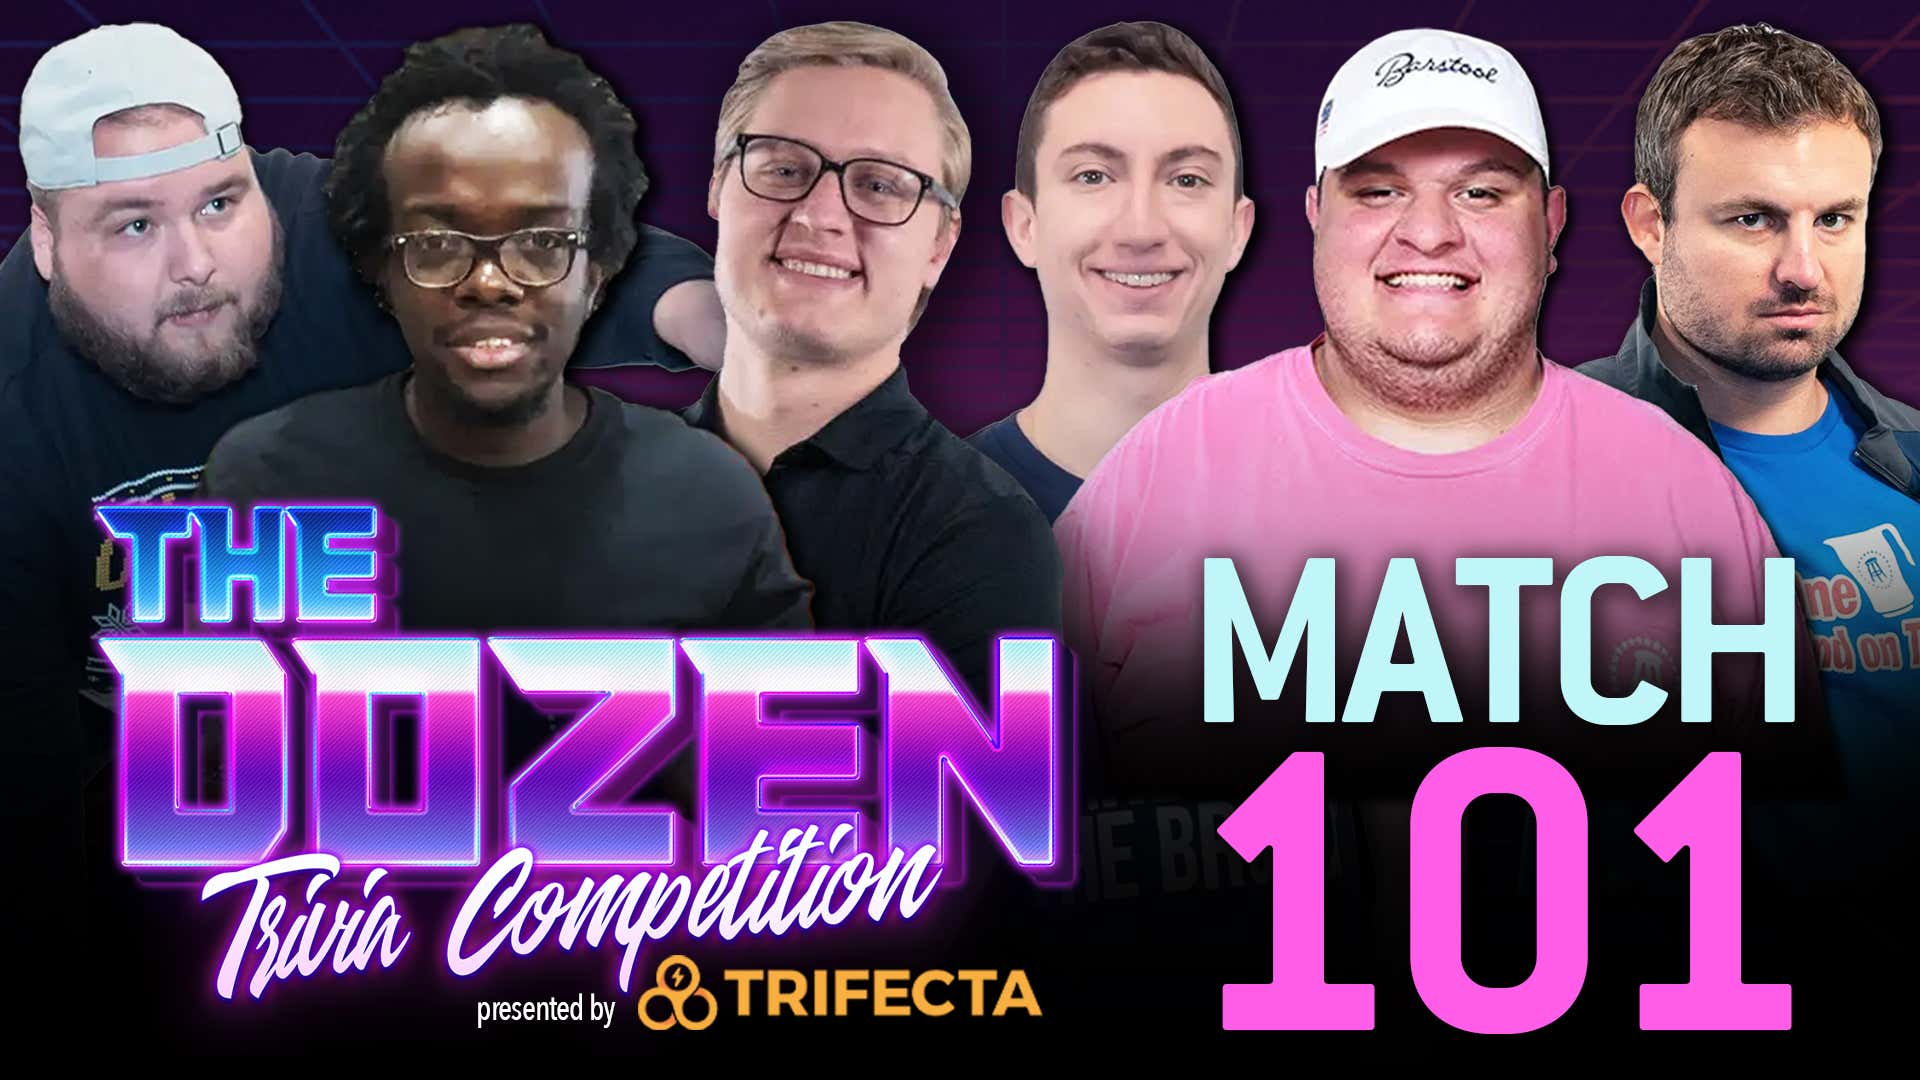 The Dozen pres. by Trifecta Nutrition - Bubble Teams Showcase I: Smitty, Tommy, Glenny Balls vs. Joey, Big Ev, Zah